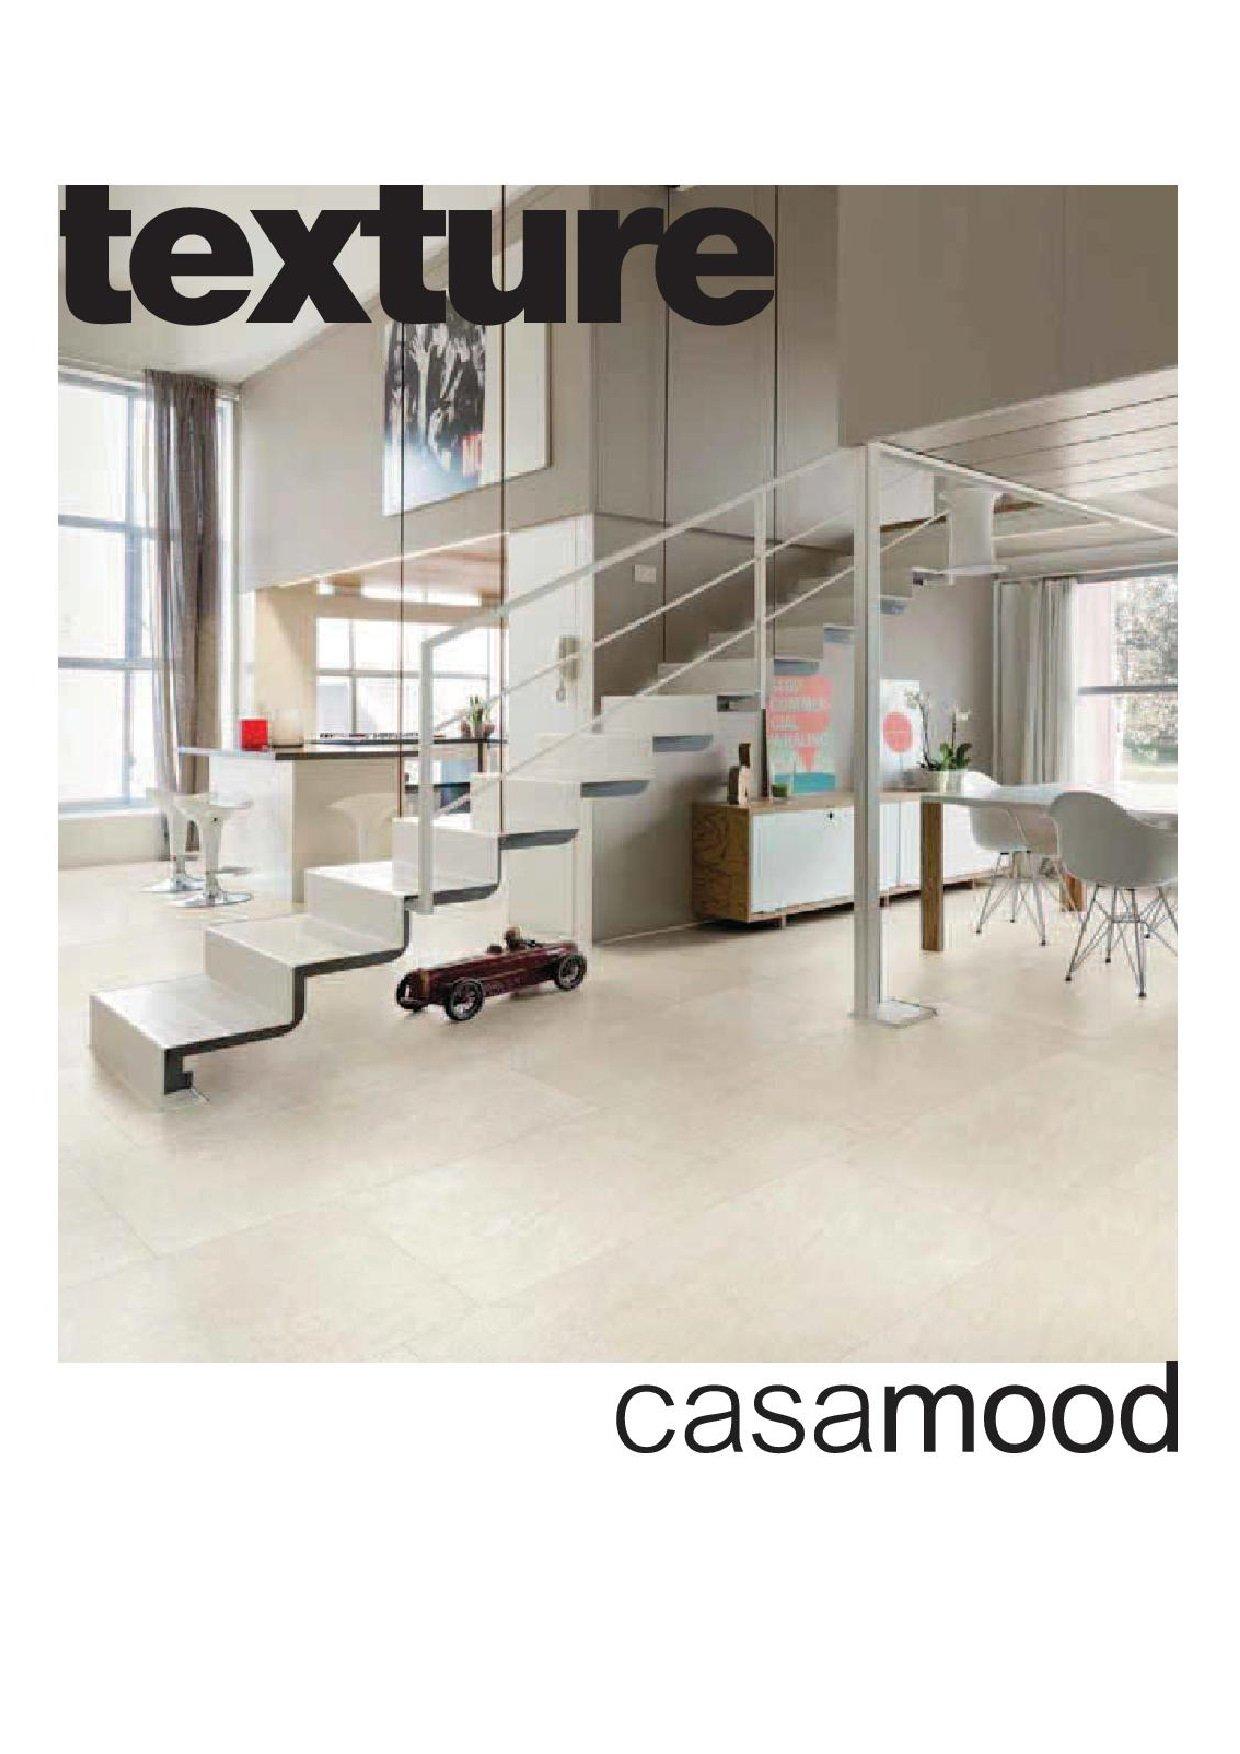 Casamood Texture